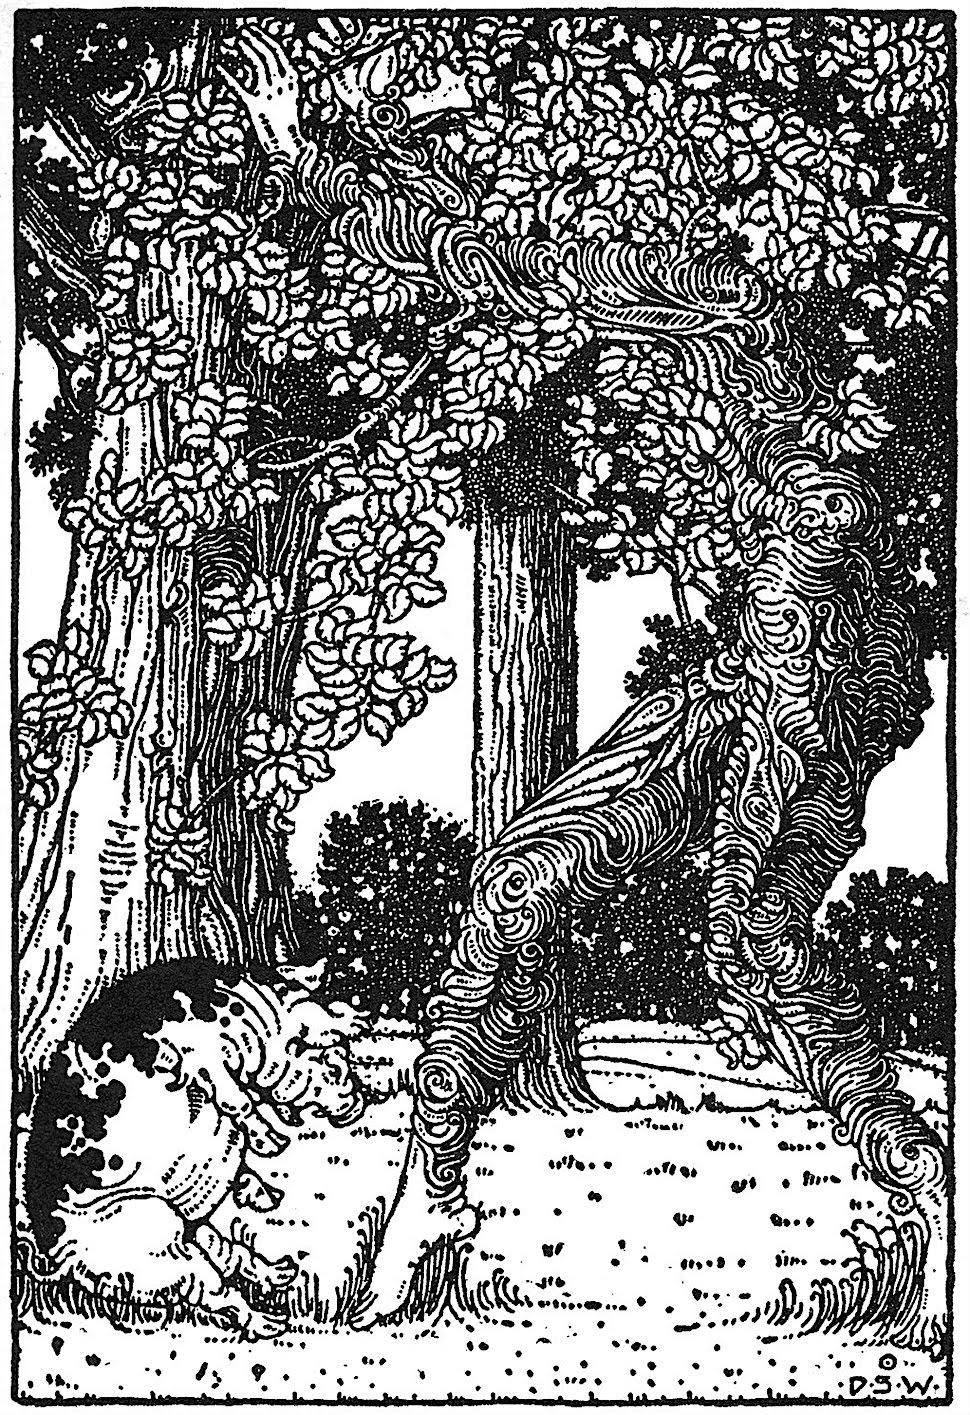 a Dugold Stewart Walker children's book illustration